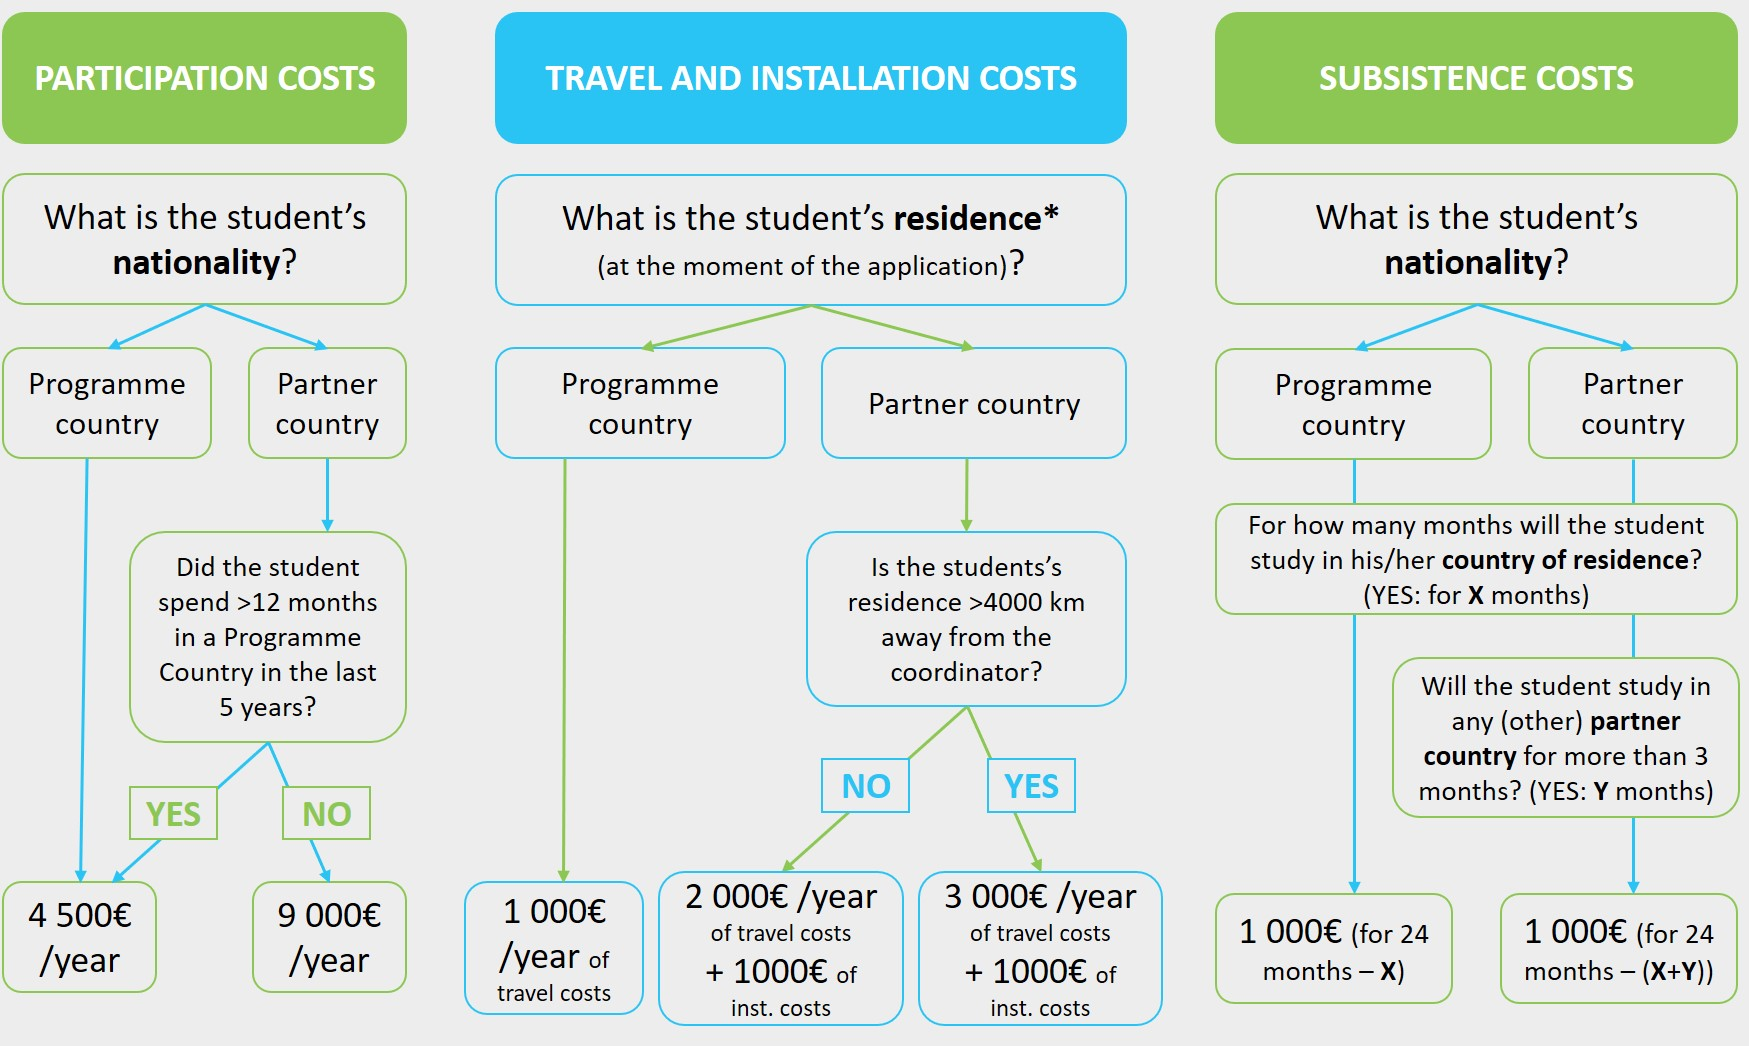 Scholarship amount calculation emPLANT+ grant stipend